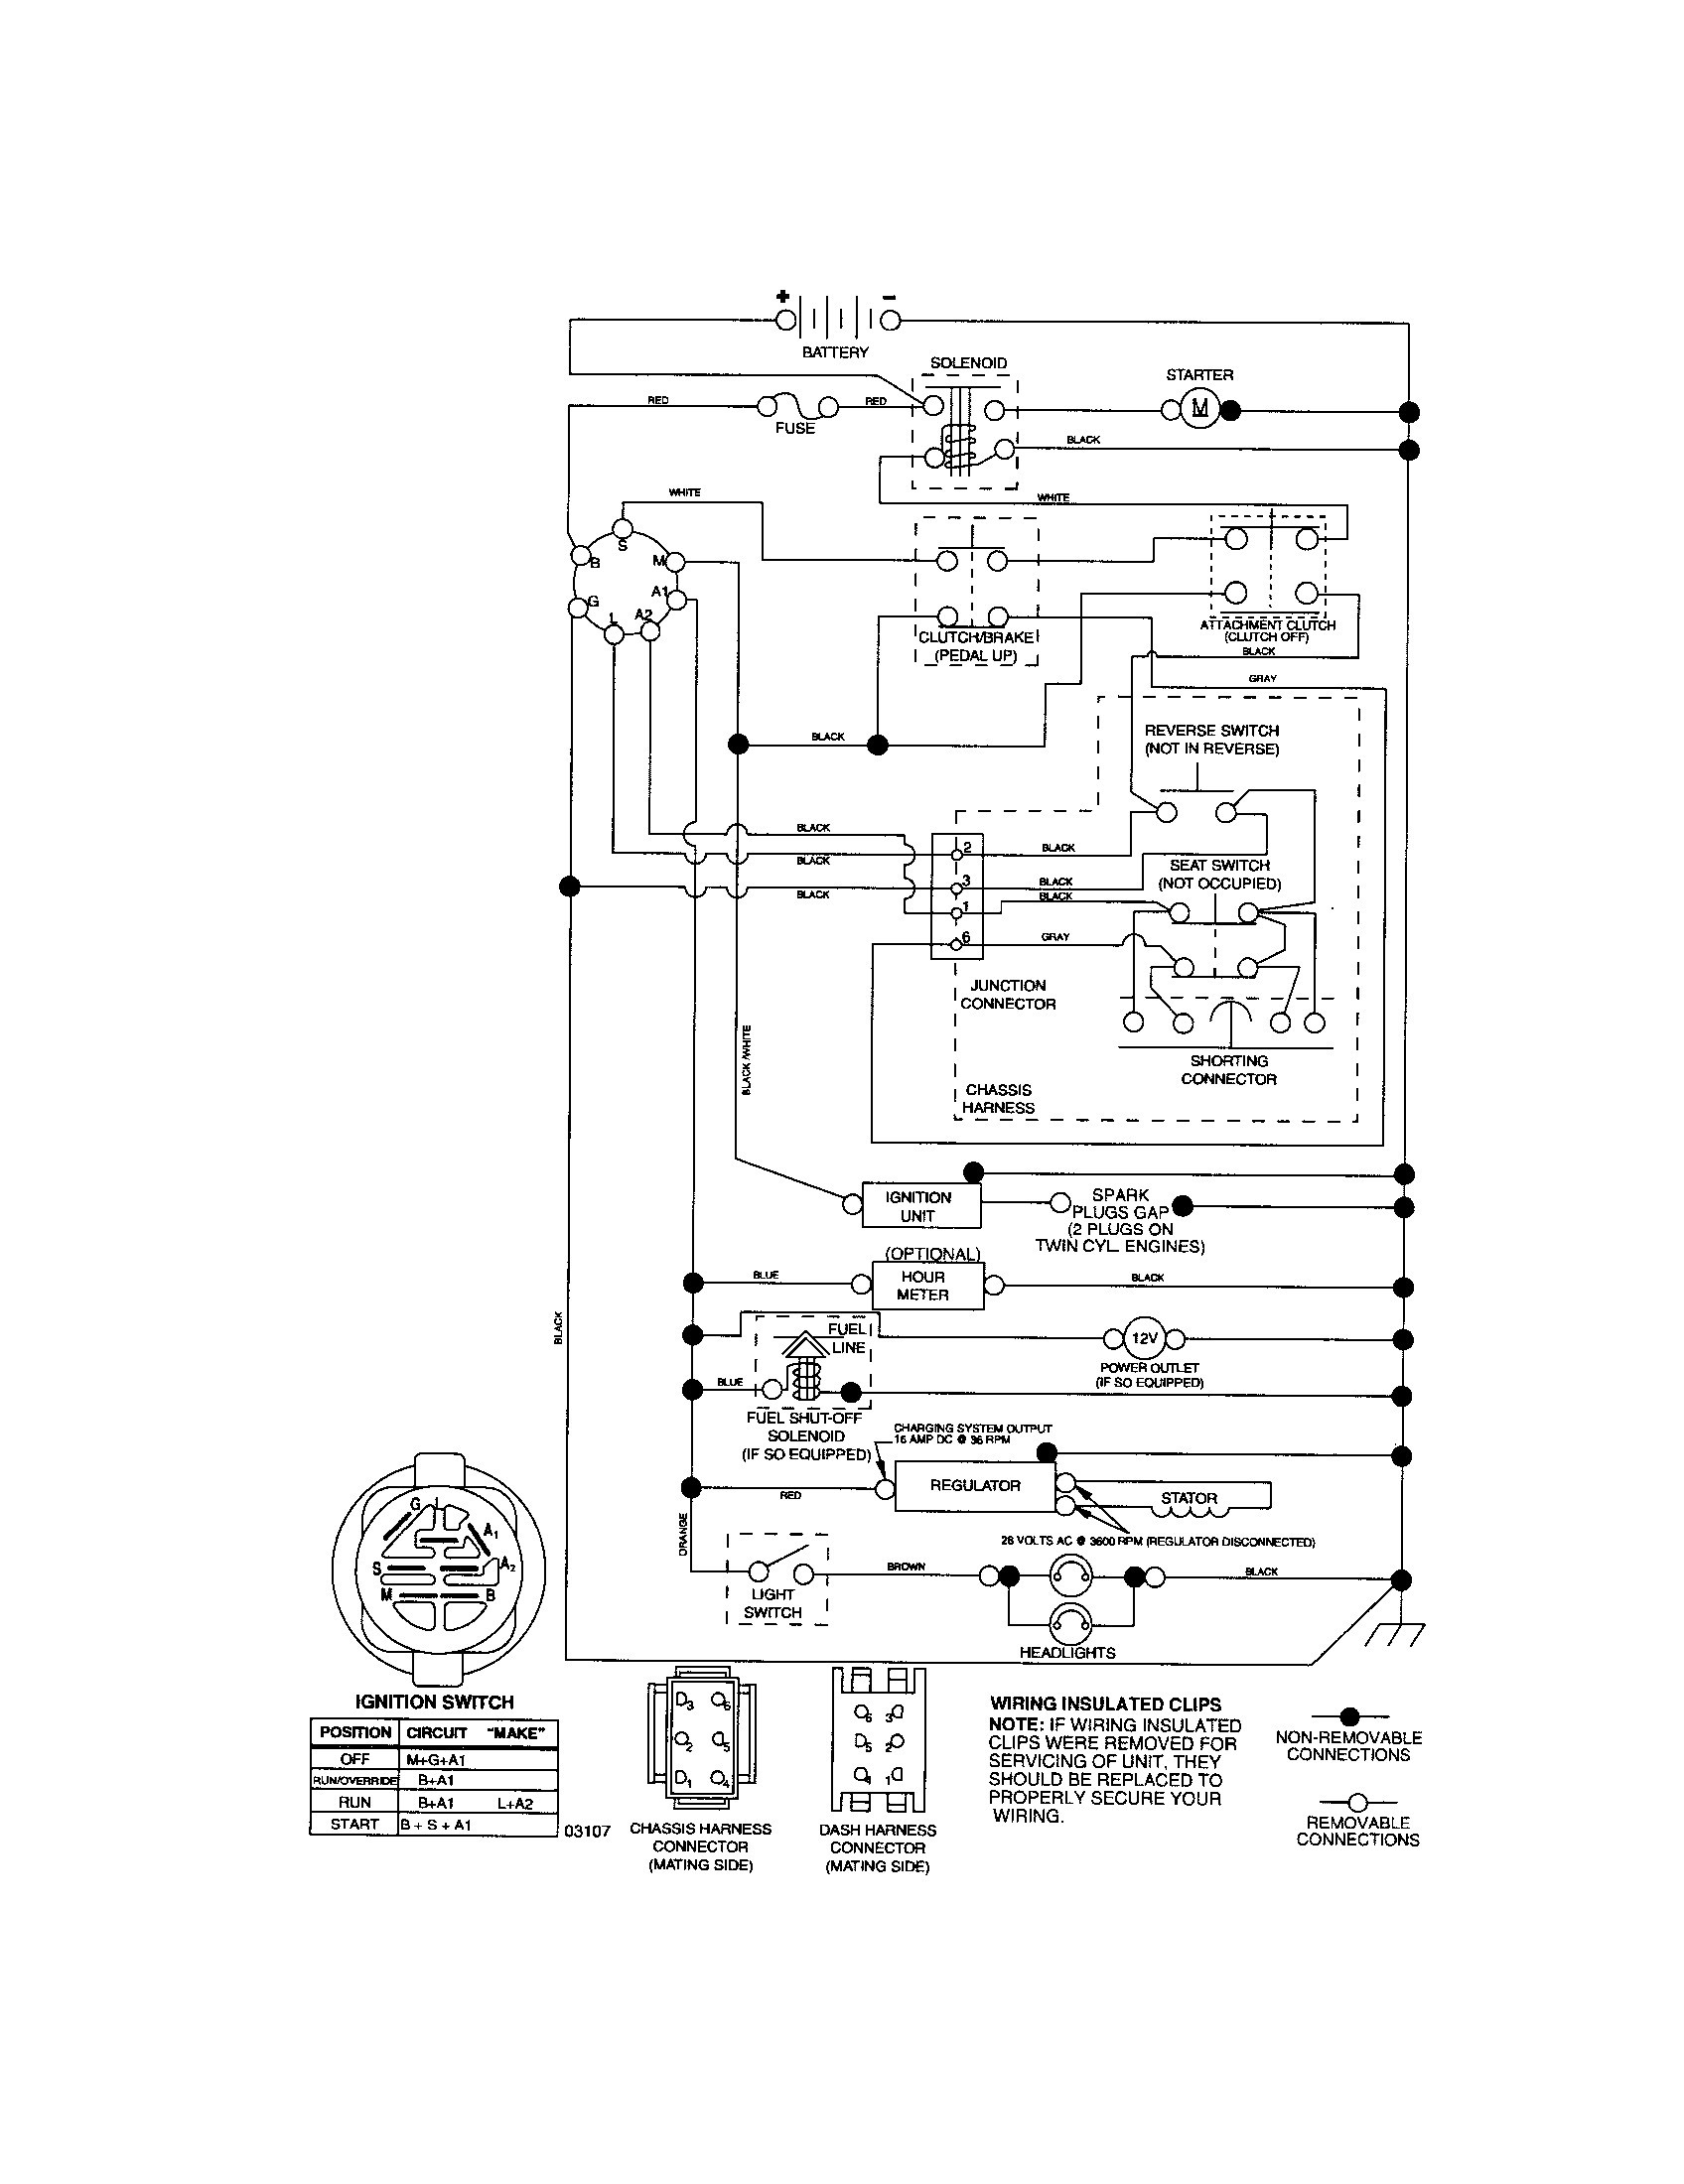 hight resolution of yard machine wiring diagram wiring diagram image troy bilt lawn tractor wiring electrical wiring diagram for yard machine mtd